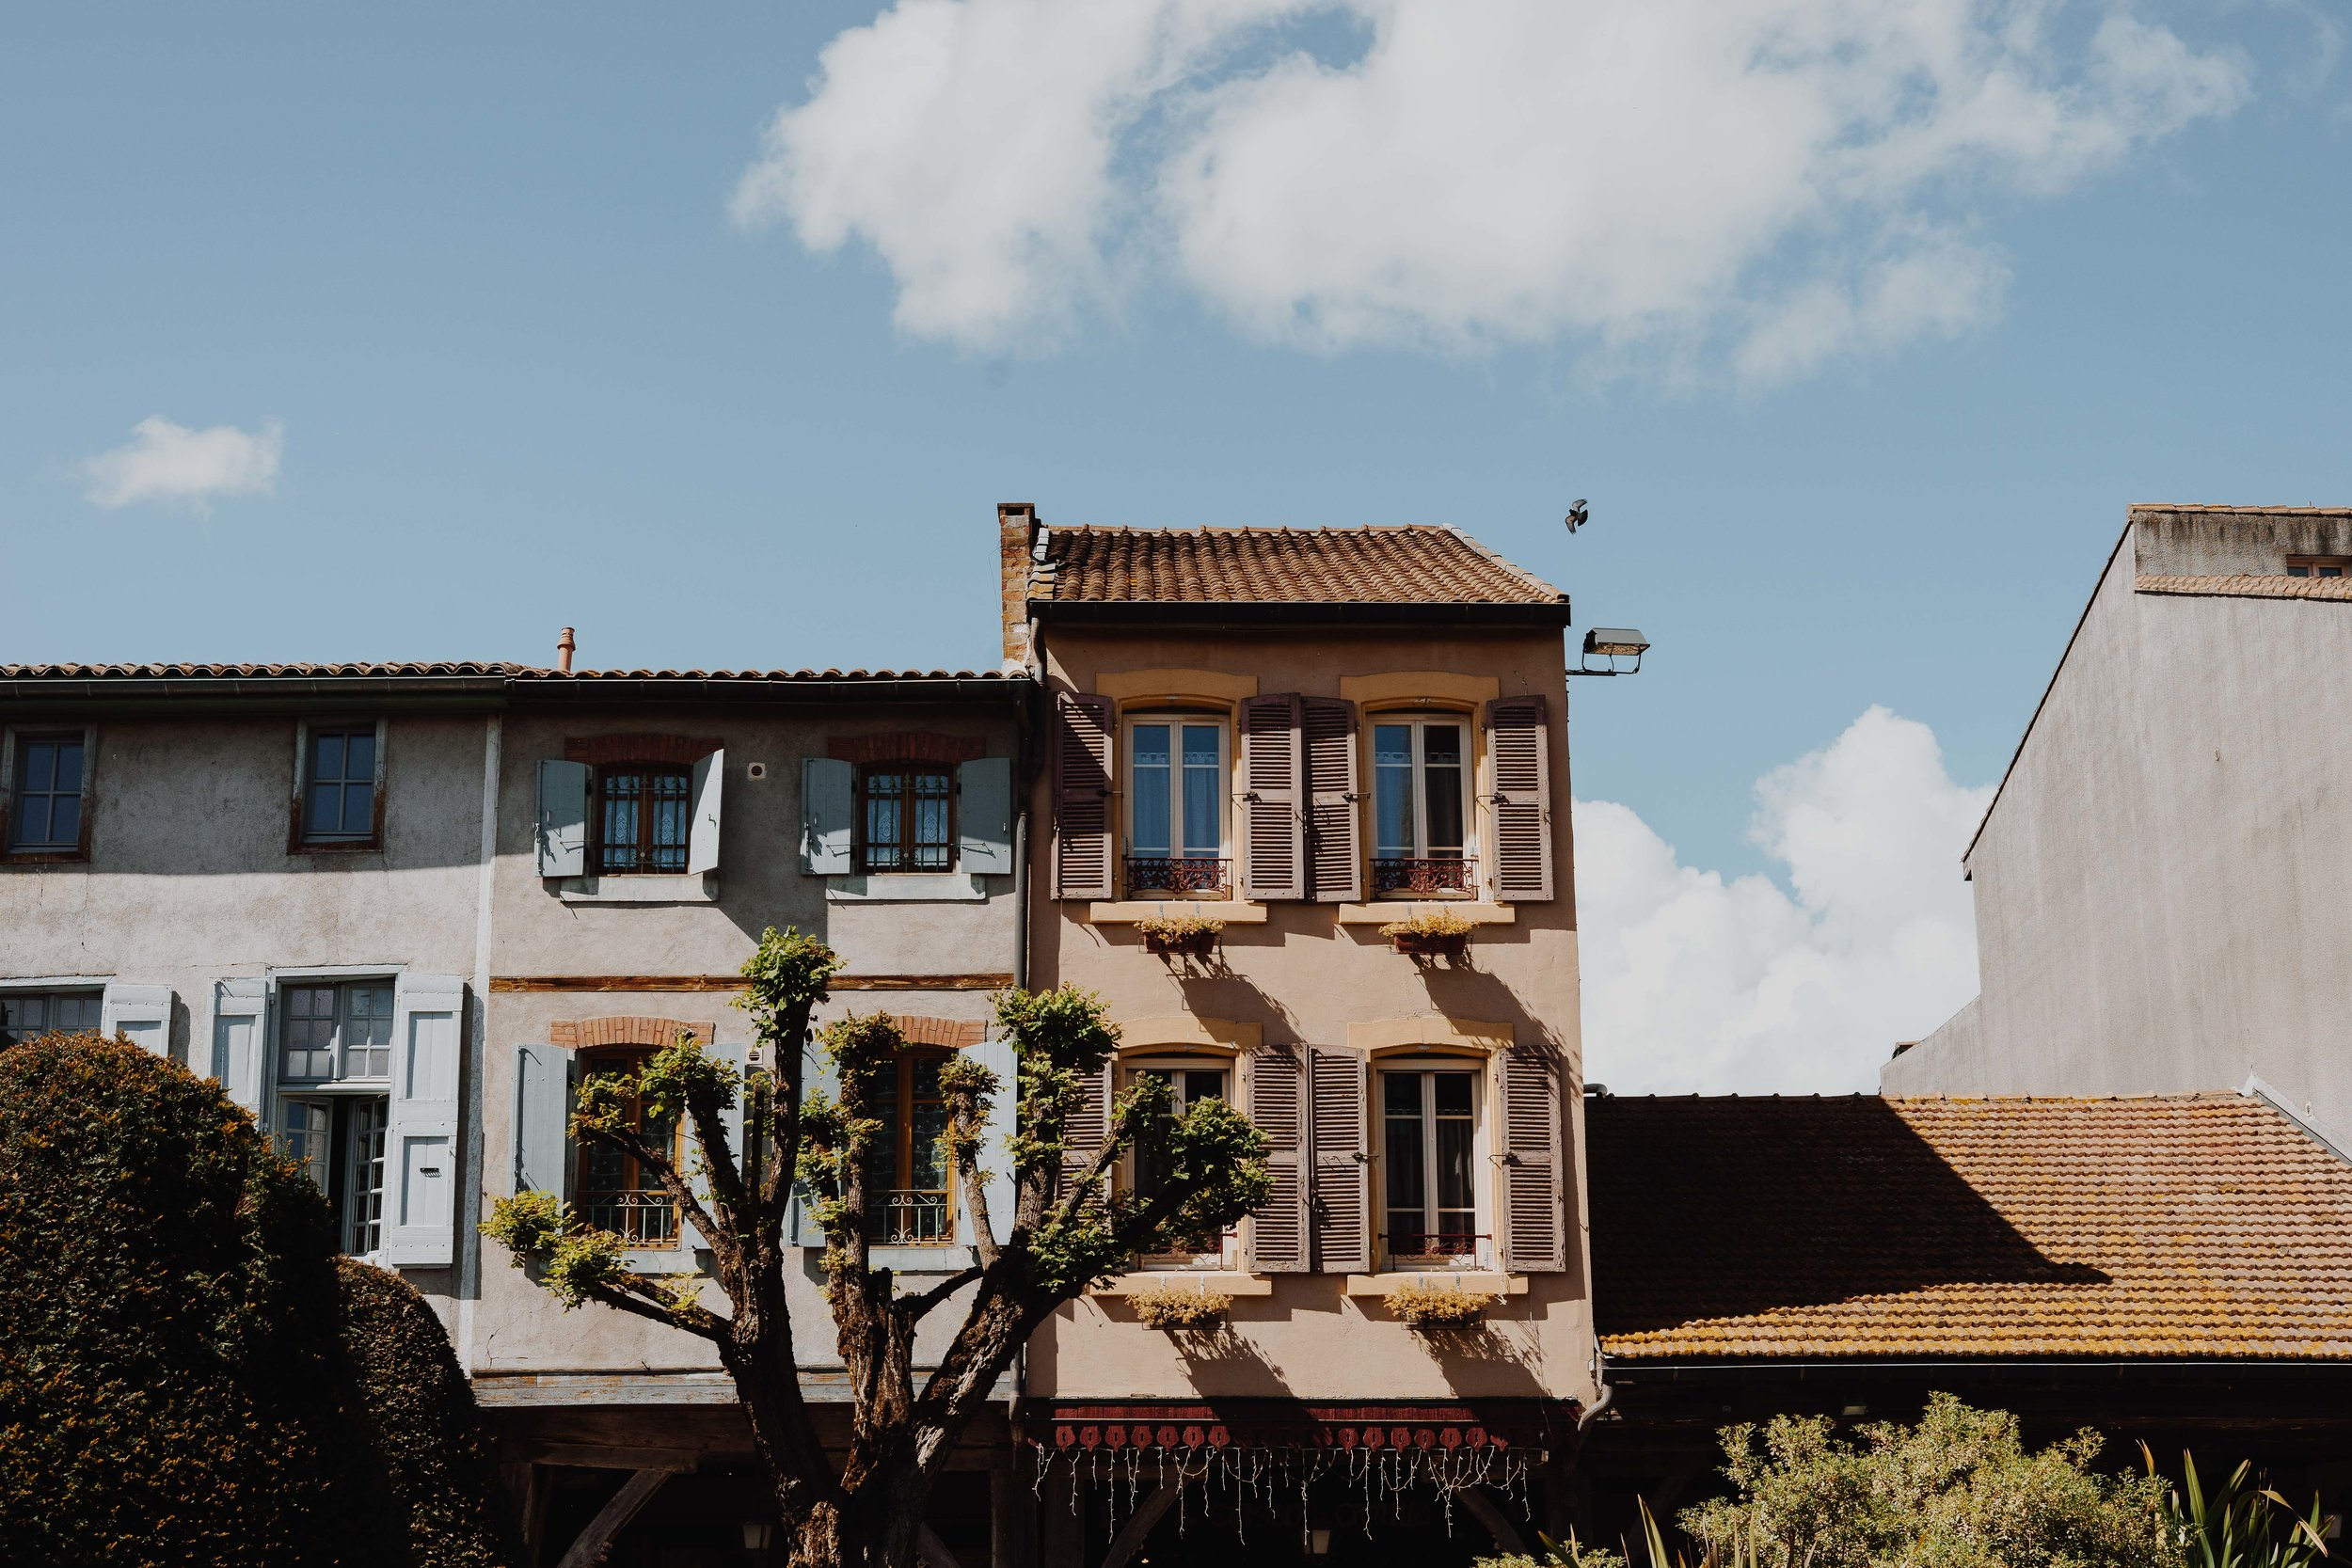 ASROSENVINGE_AtoutFrance_Occitanie_Toulouse_LowRes-214.jpg